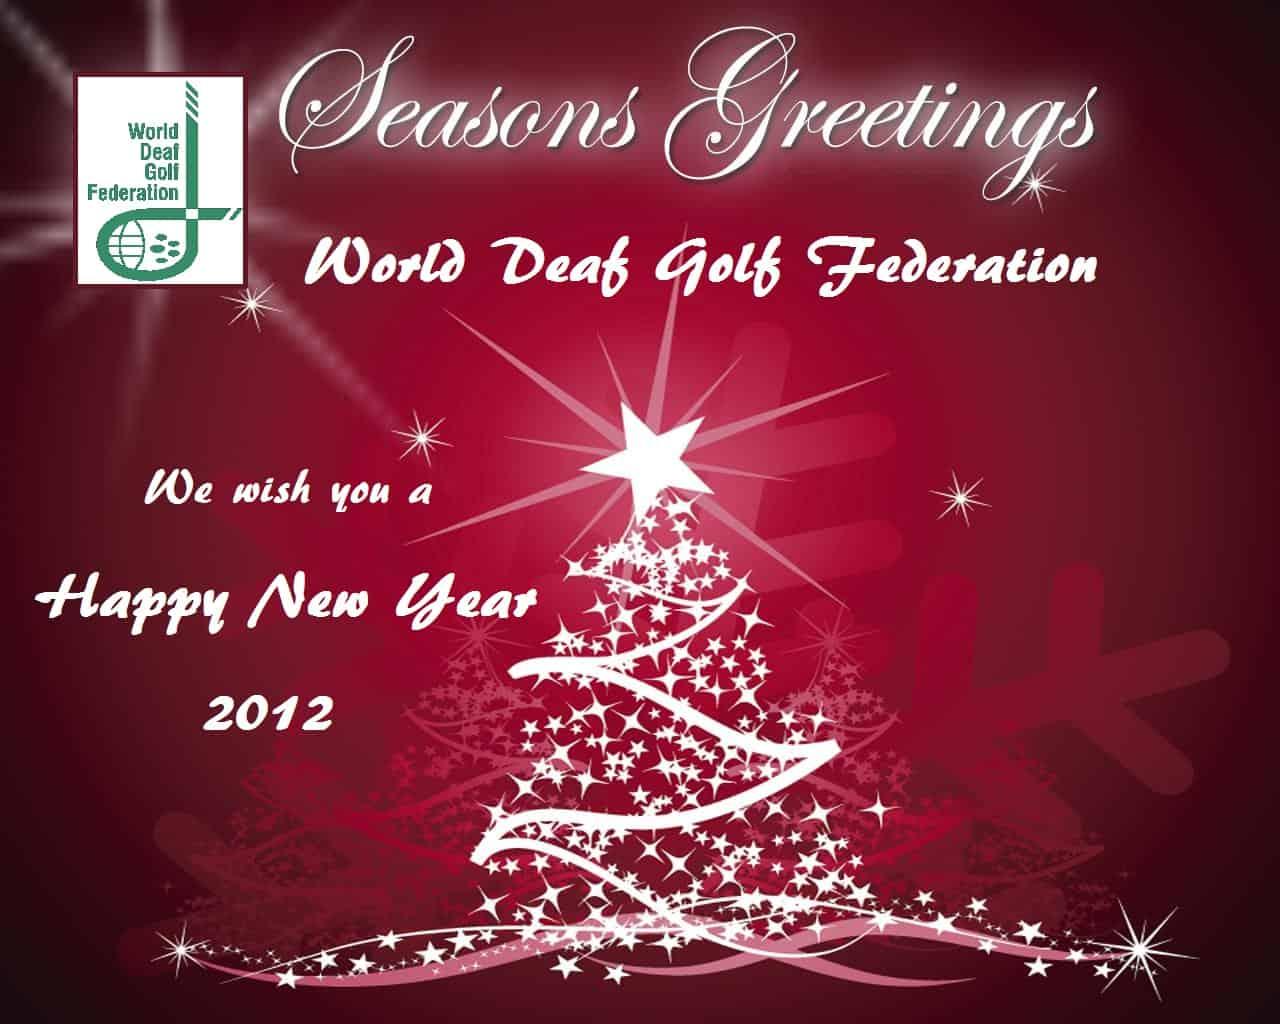 Seasons Greetings 2011 and Happy New Year 2012! – World Deaf Golf ...